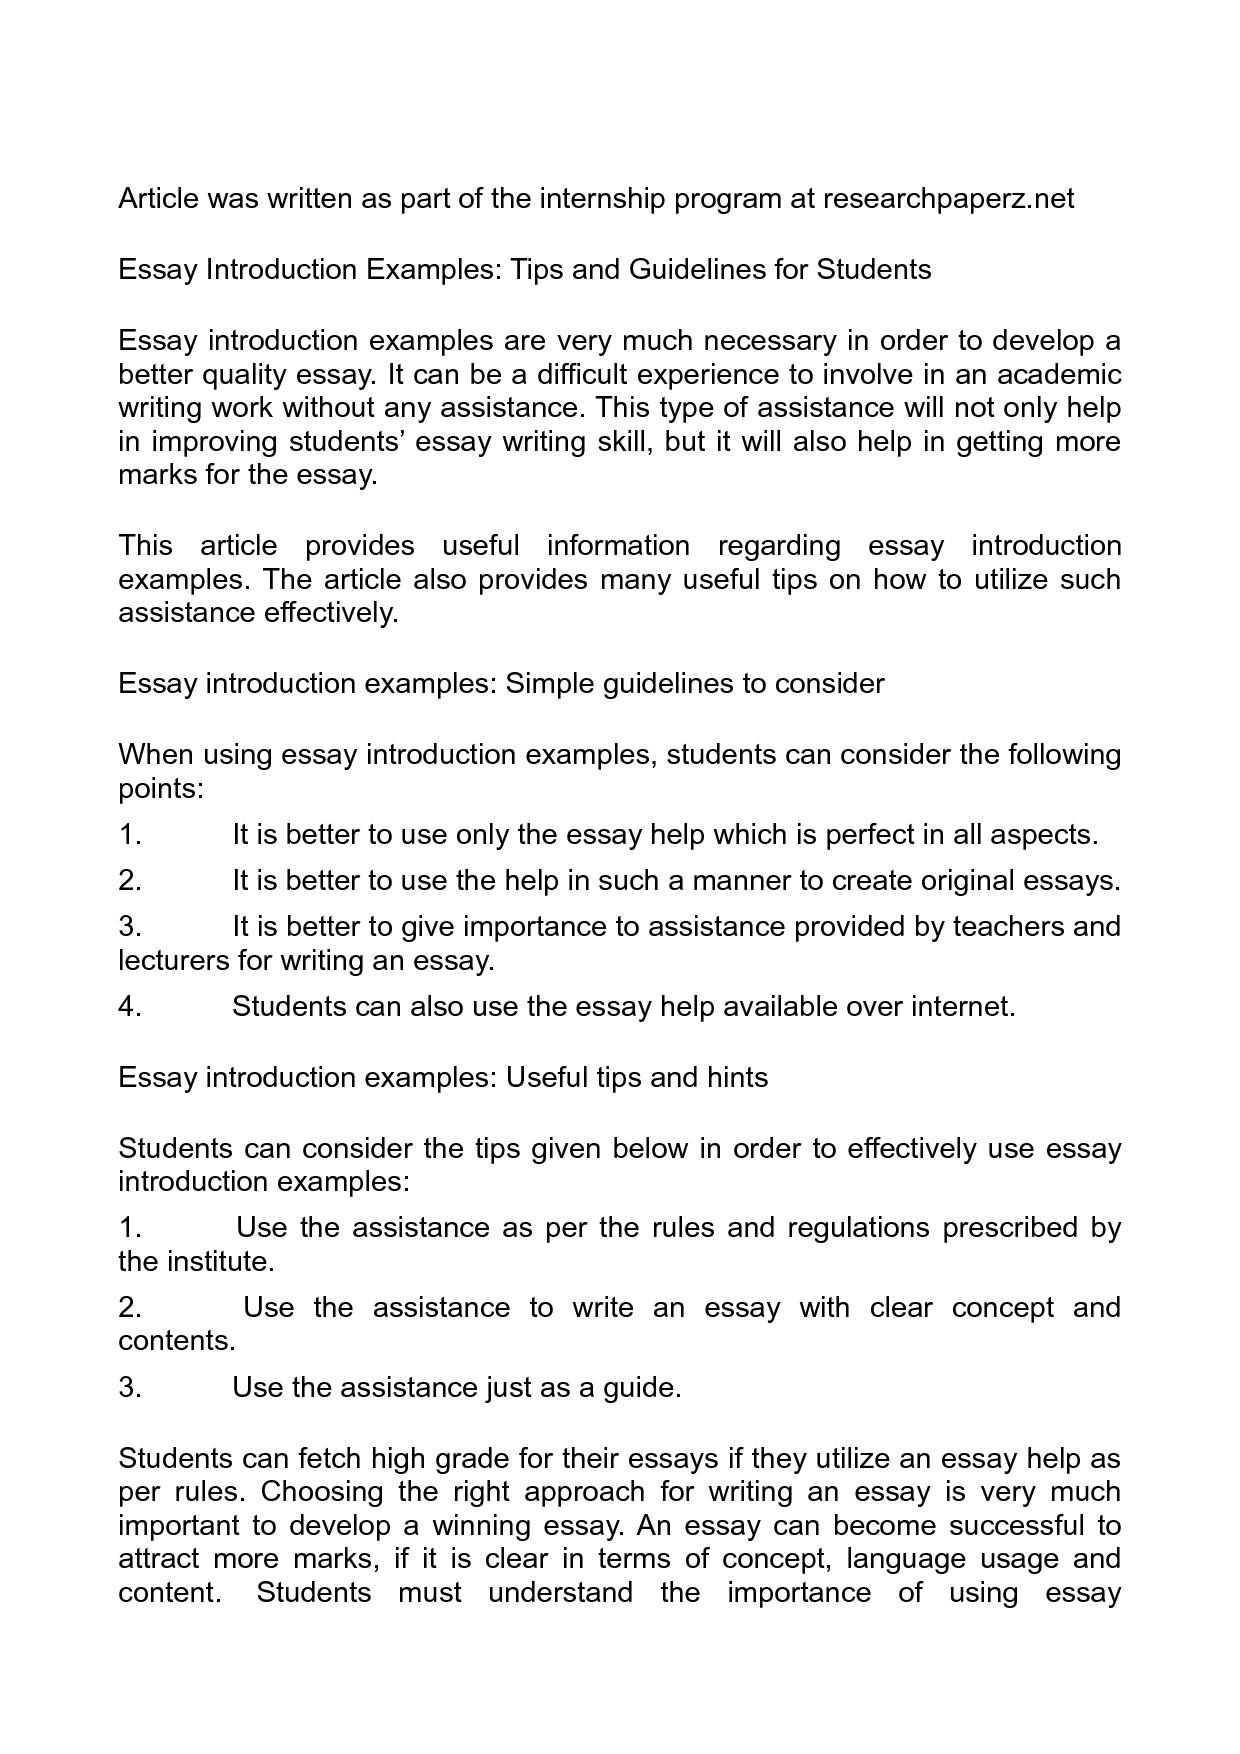 002 Essay Example Introduction Samples Frightening Sample Tagalog Argumentative Format Template Full